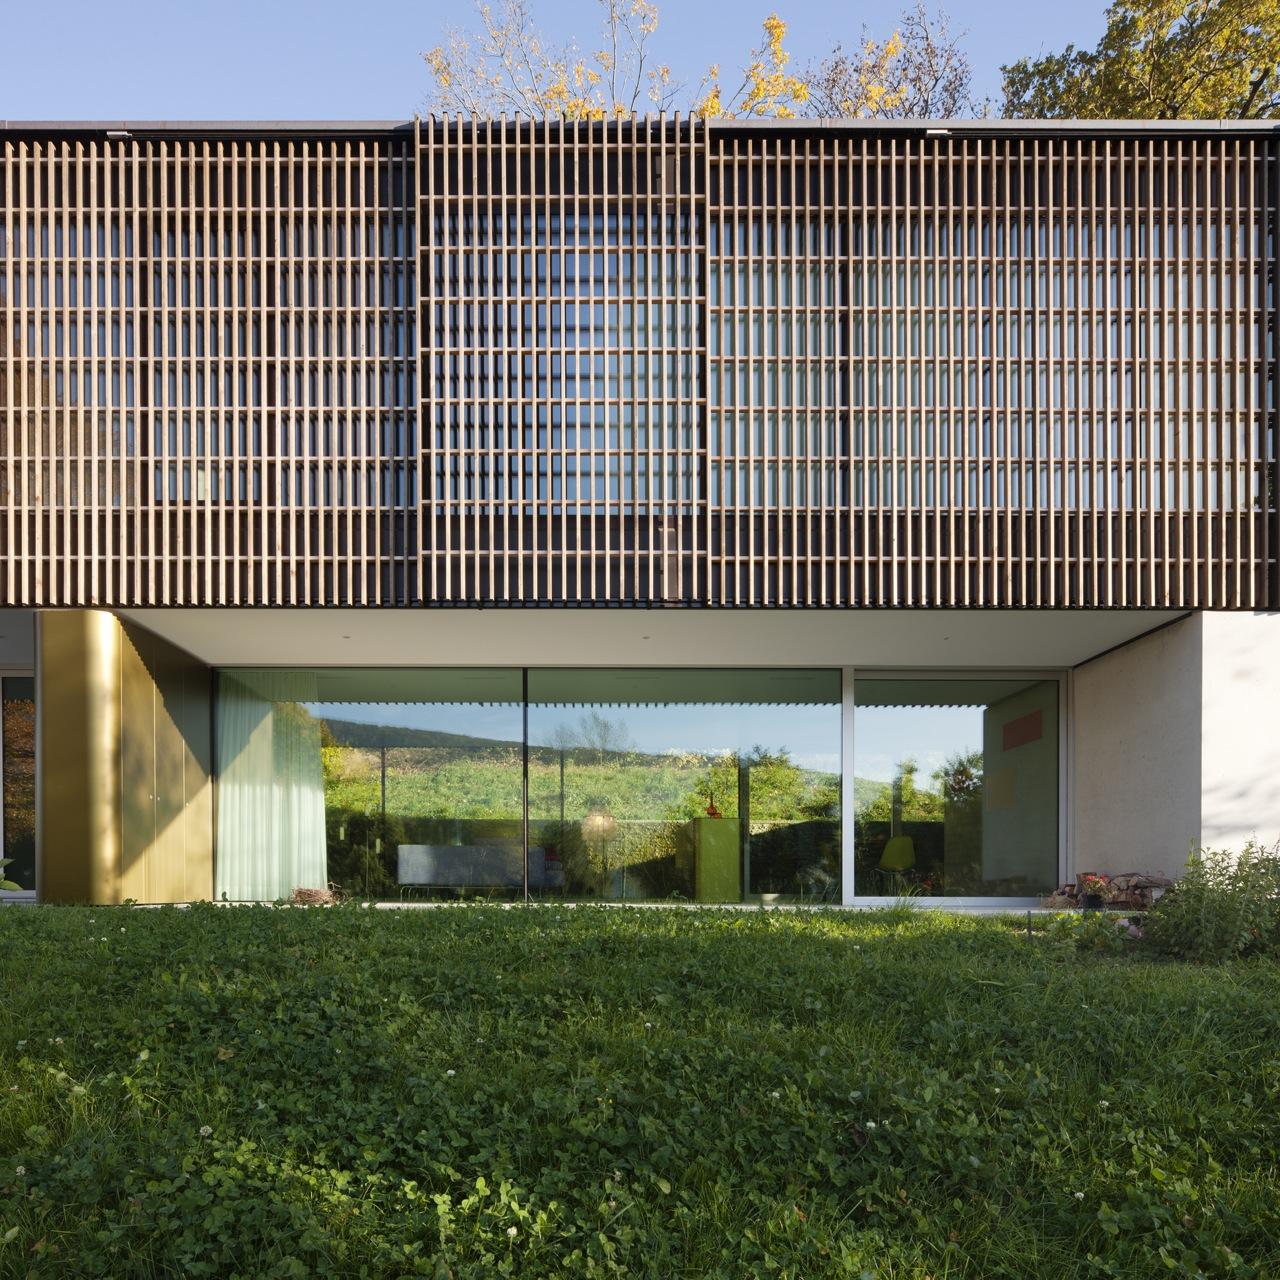 Single House Lake of Biel / bauzeit architekten, © Yves Andre